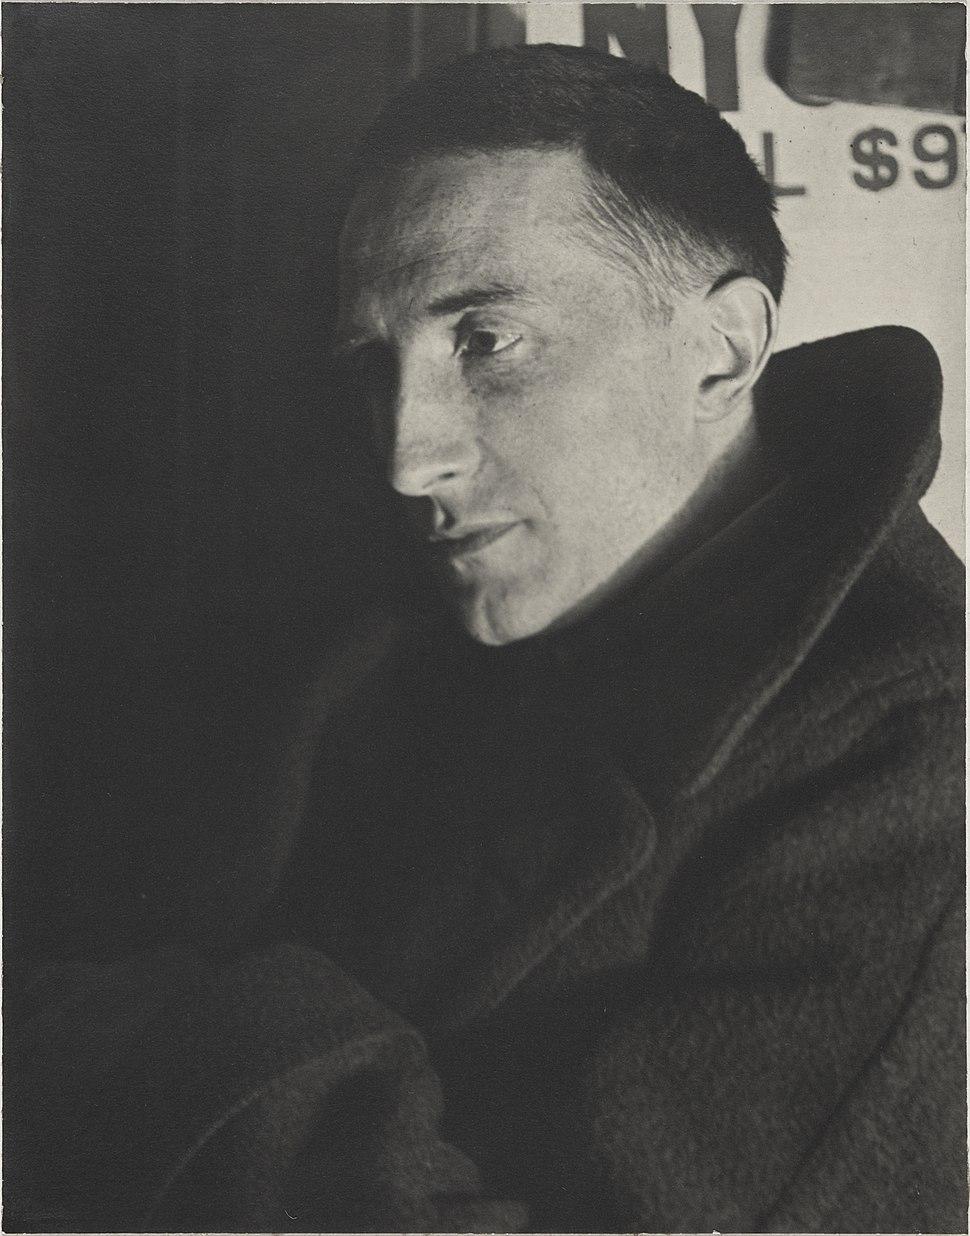 Man Ray, 1920-21, Portrait of Marcel Duchamp, gelatin silver print, Yale University Art Gallery